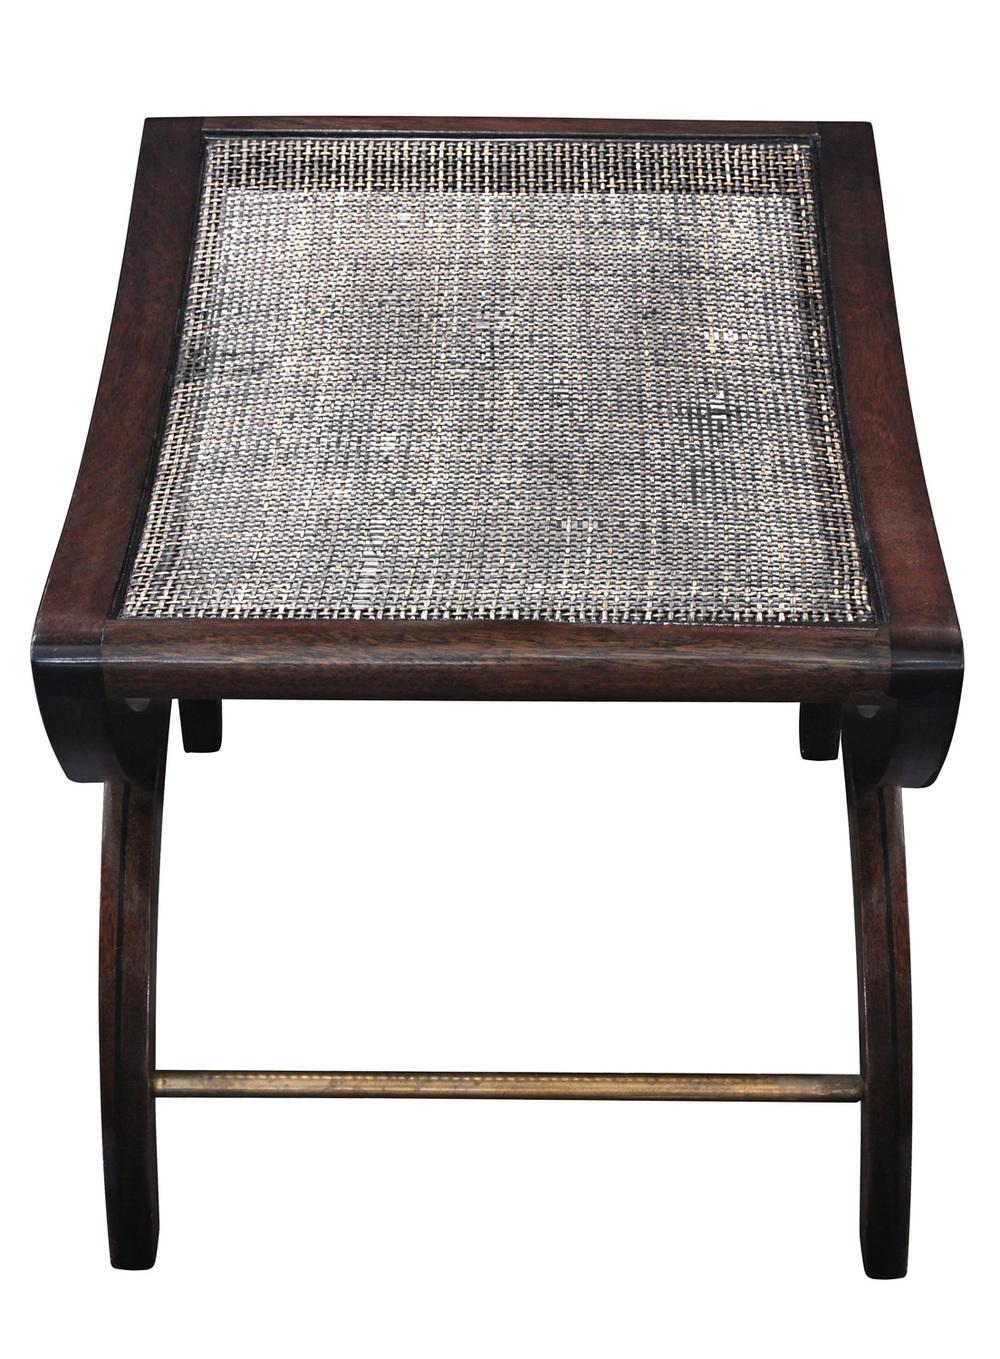 Dunbar 55 mahg+inset cane top bench105 detail2 hires.jpg